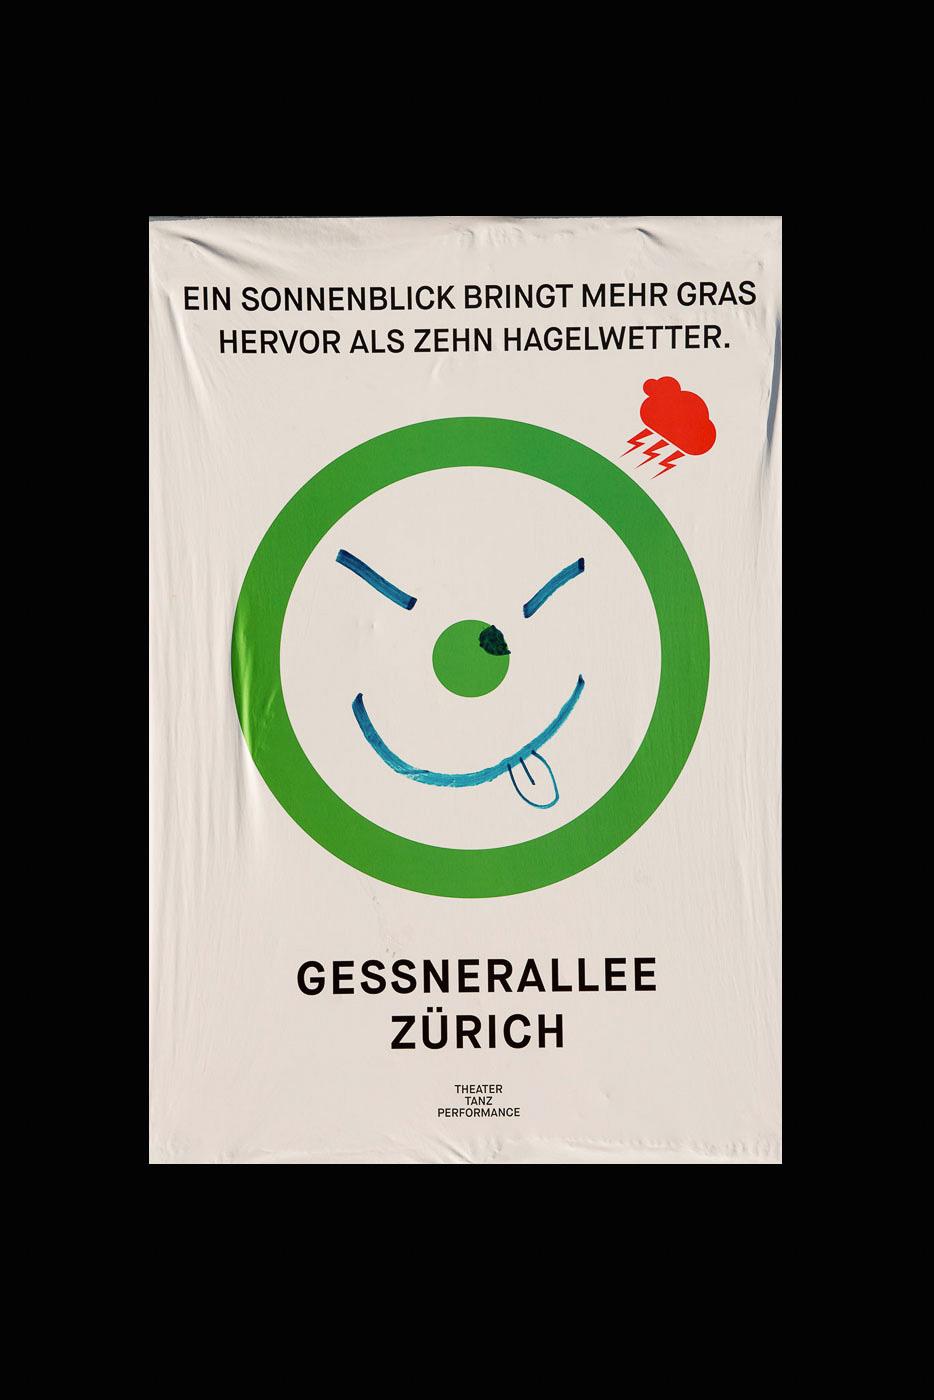 Gessnerallee Zürich | Plakatkampagne 2014/15